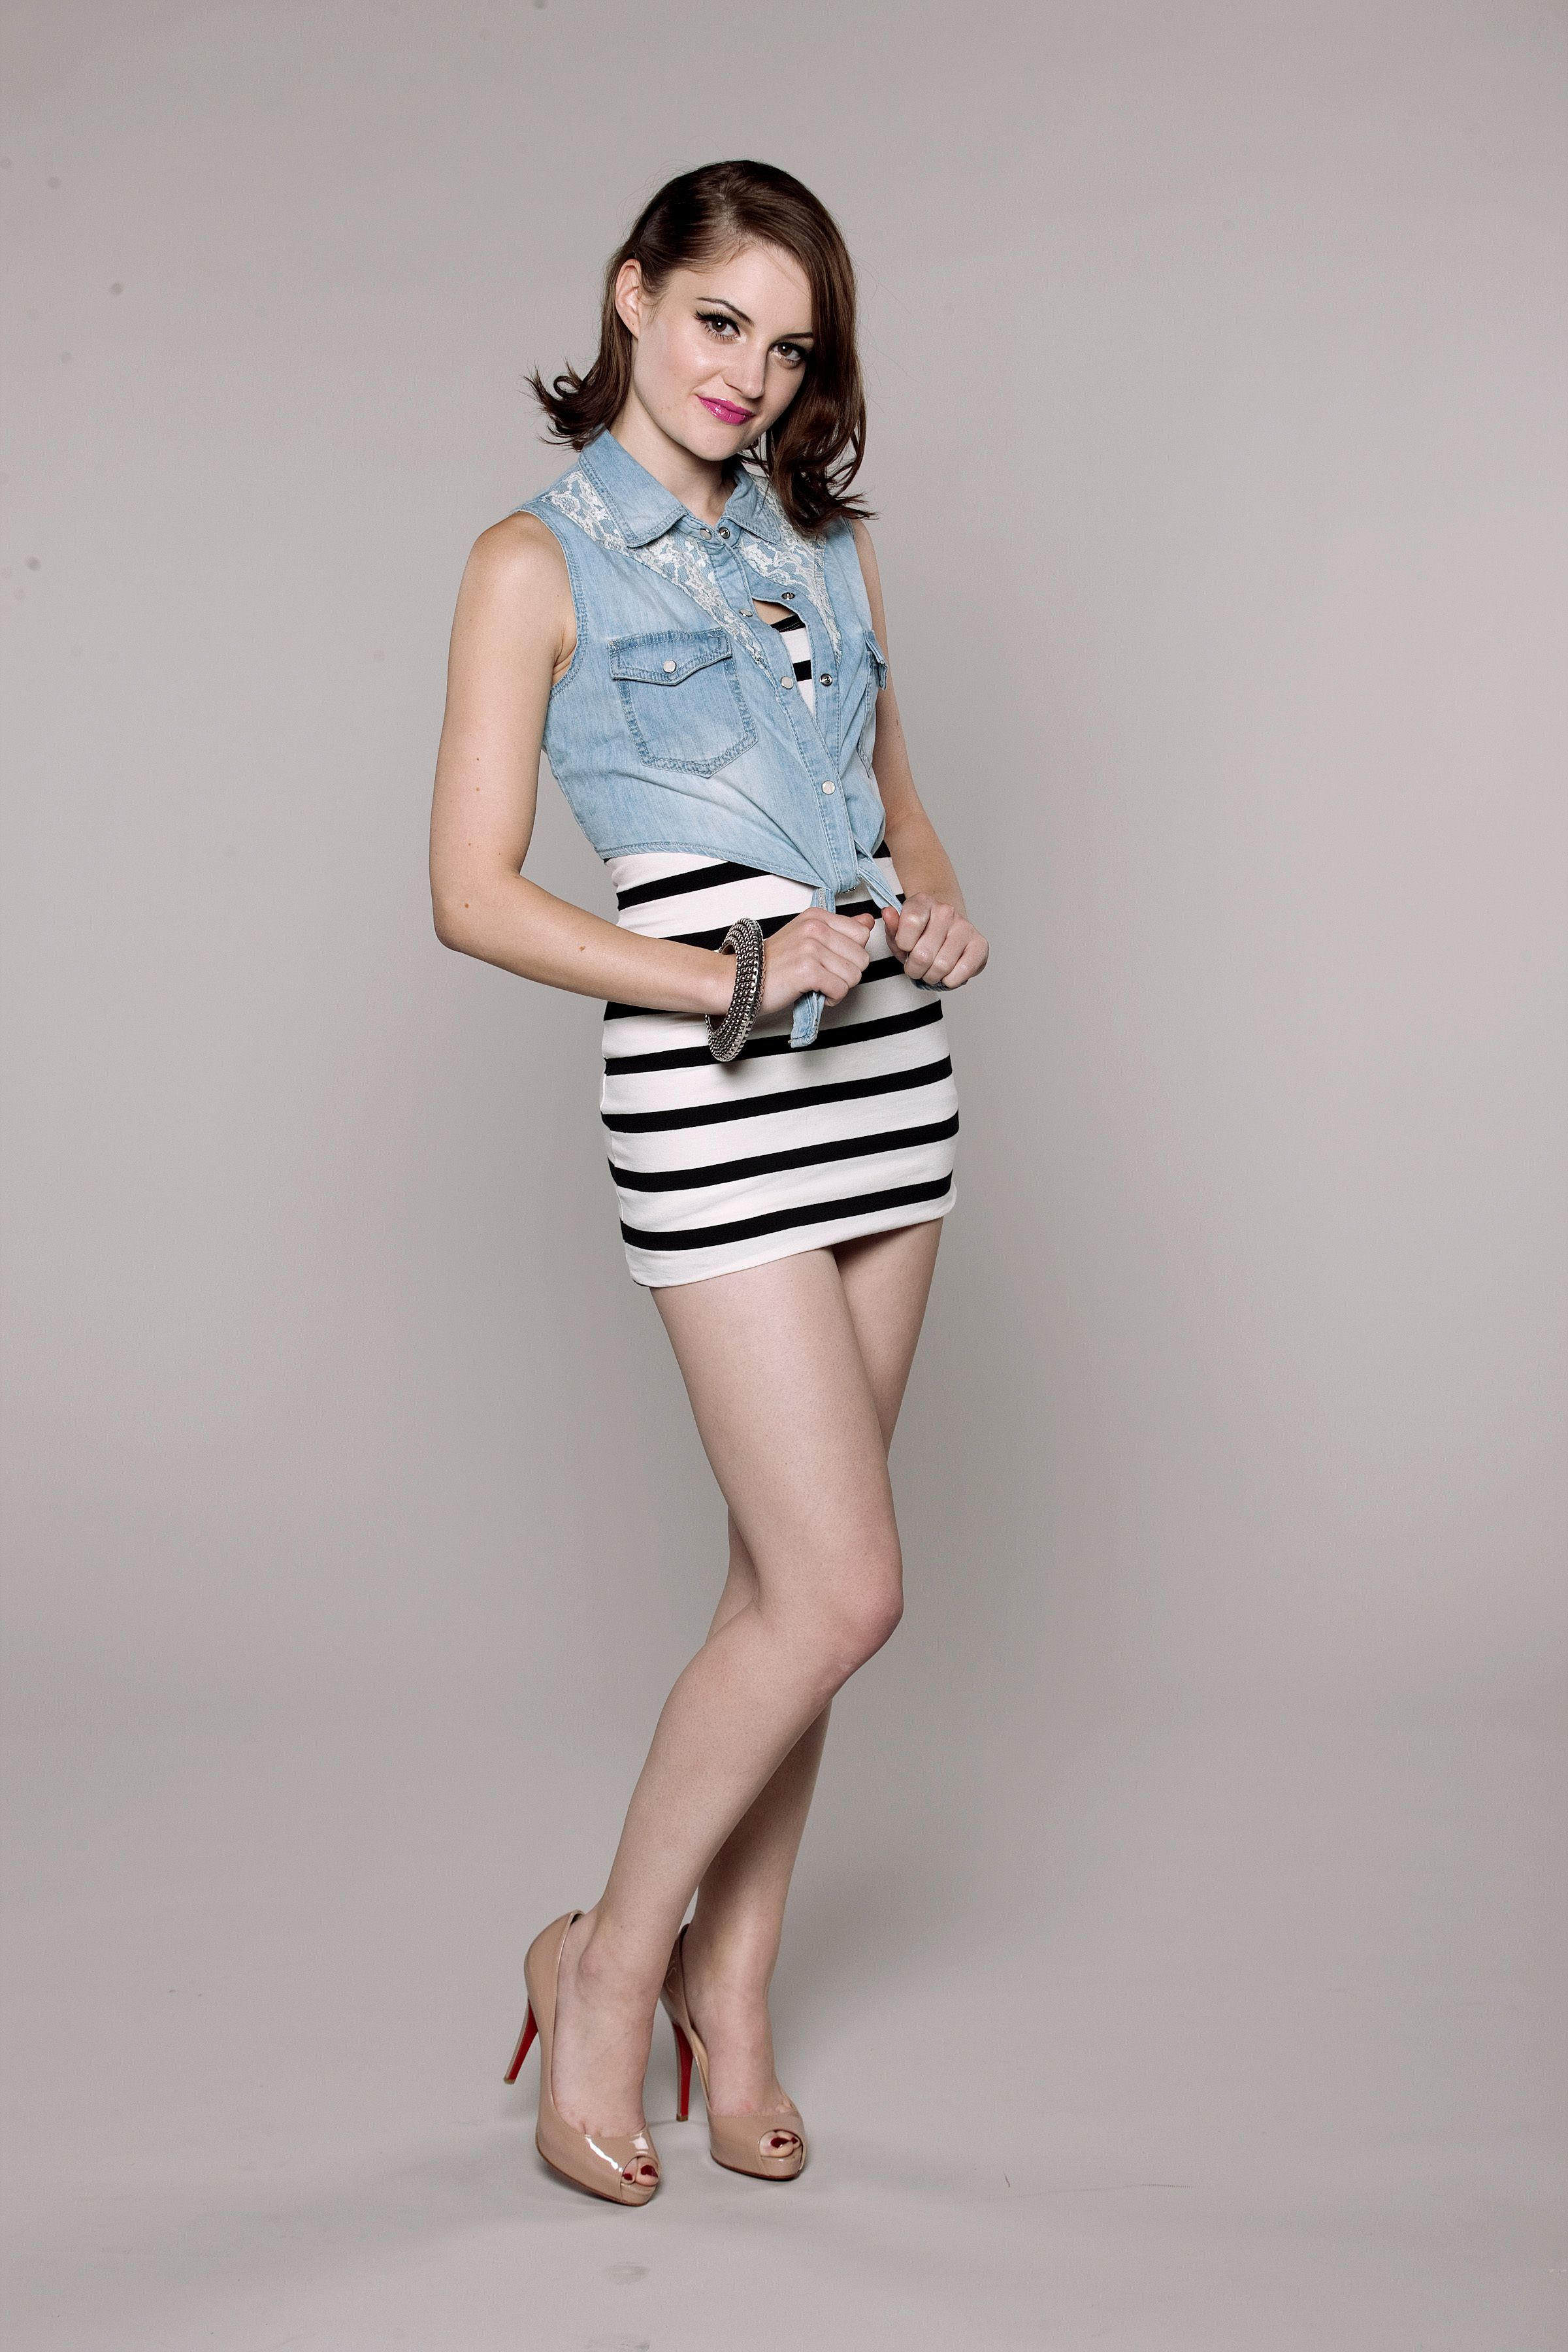 Coronation Street Bikini Tops Hot Bikini Short Skirts Mini Skirts Spike